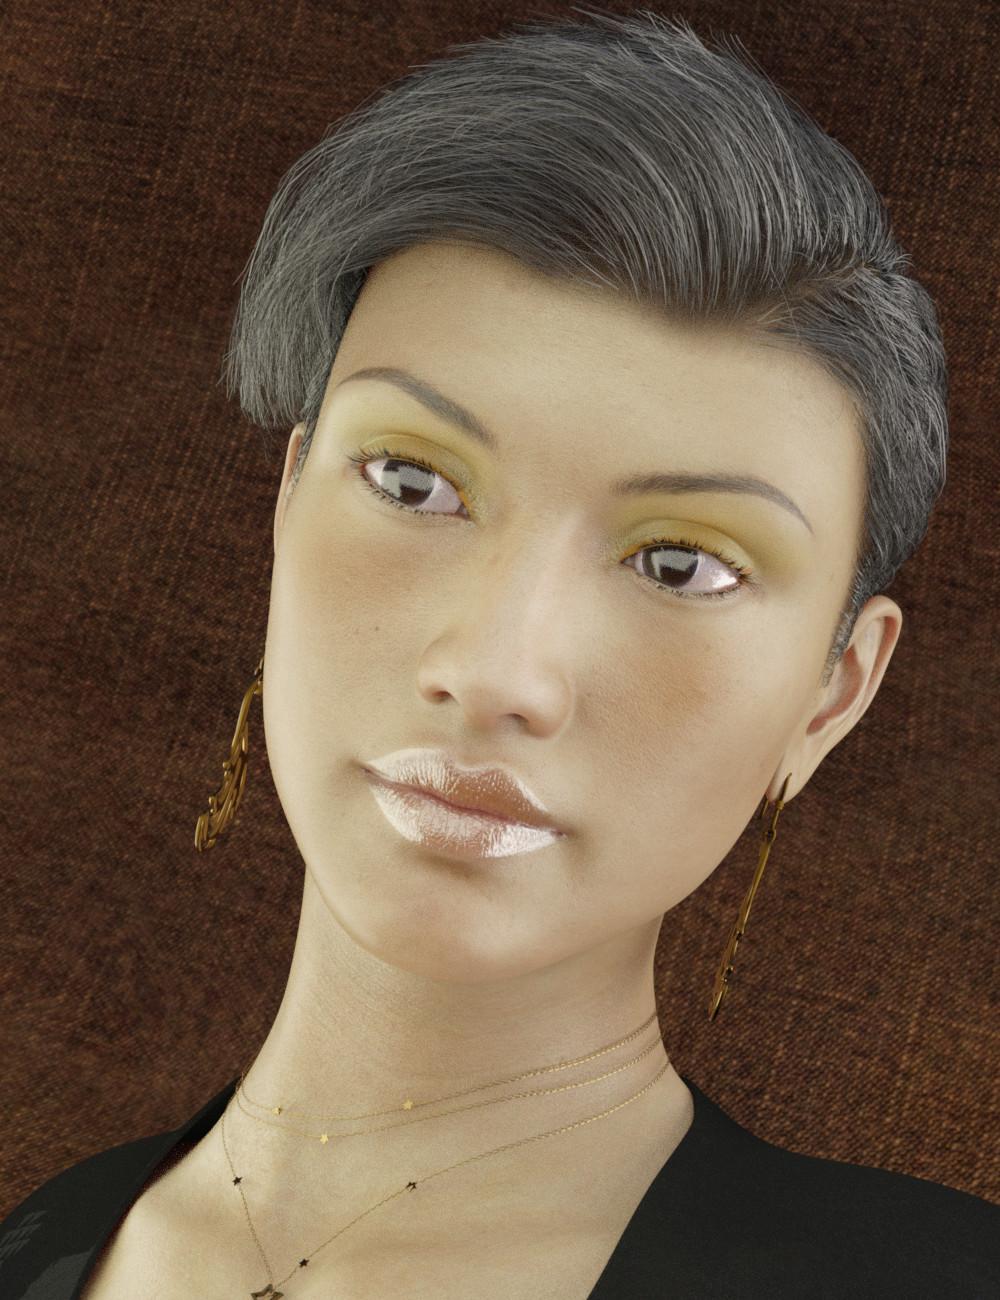 FSL Ultimate Layered Shimmer Makeups by: FuselingSickleyield, 3D Models by Daz 3D